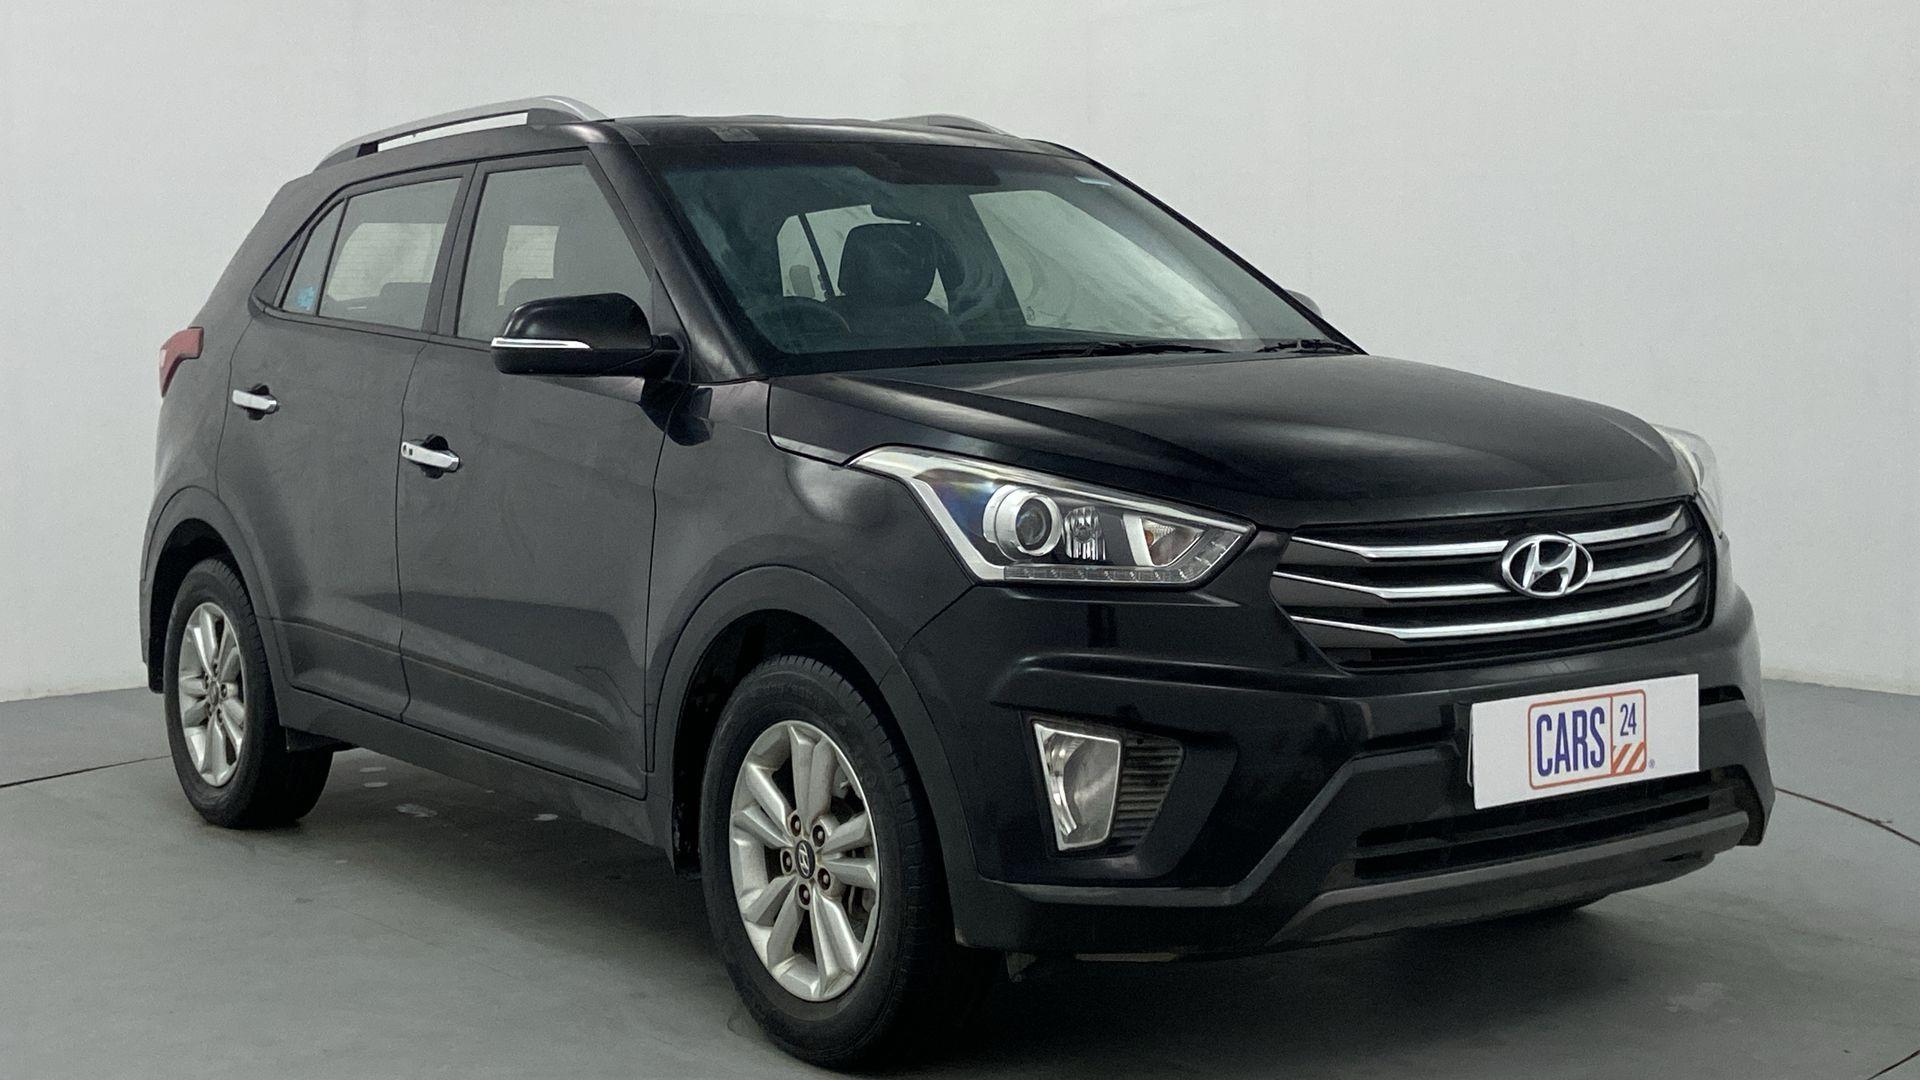 2015 Hyundai Creta 1.6 CRDI SX PLUS AUTO